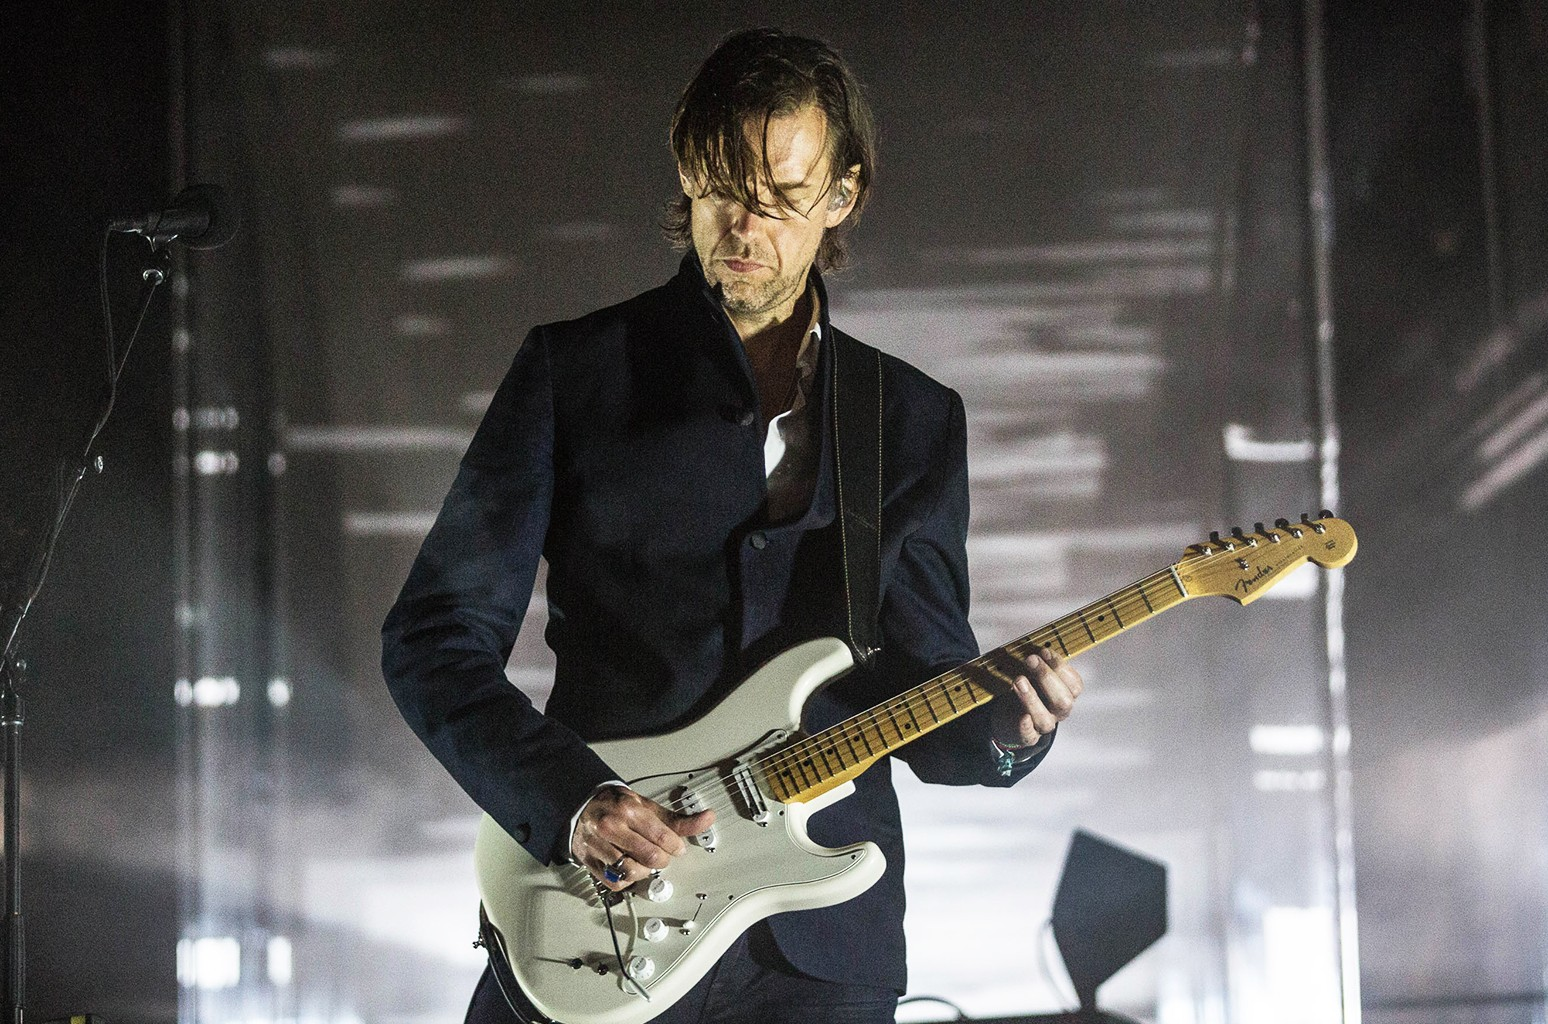 Ed O'Brien of Radiohead performs at Primavera Sound